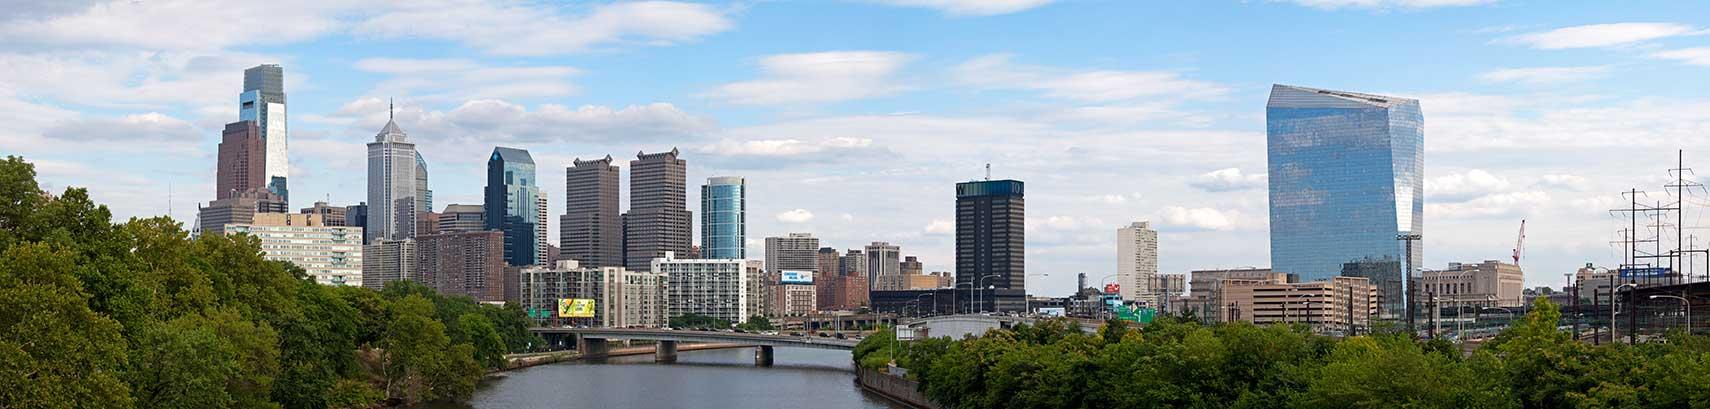 Google Map Of Philadelphia Pennsylvania USA Nations Online Project - Philadelphia map in usa